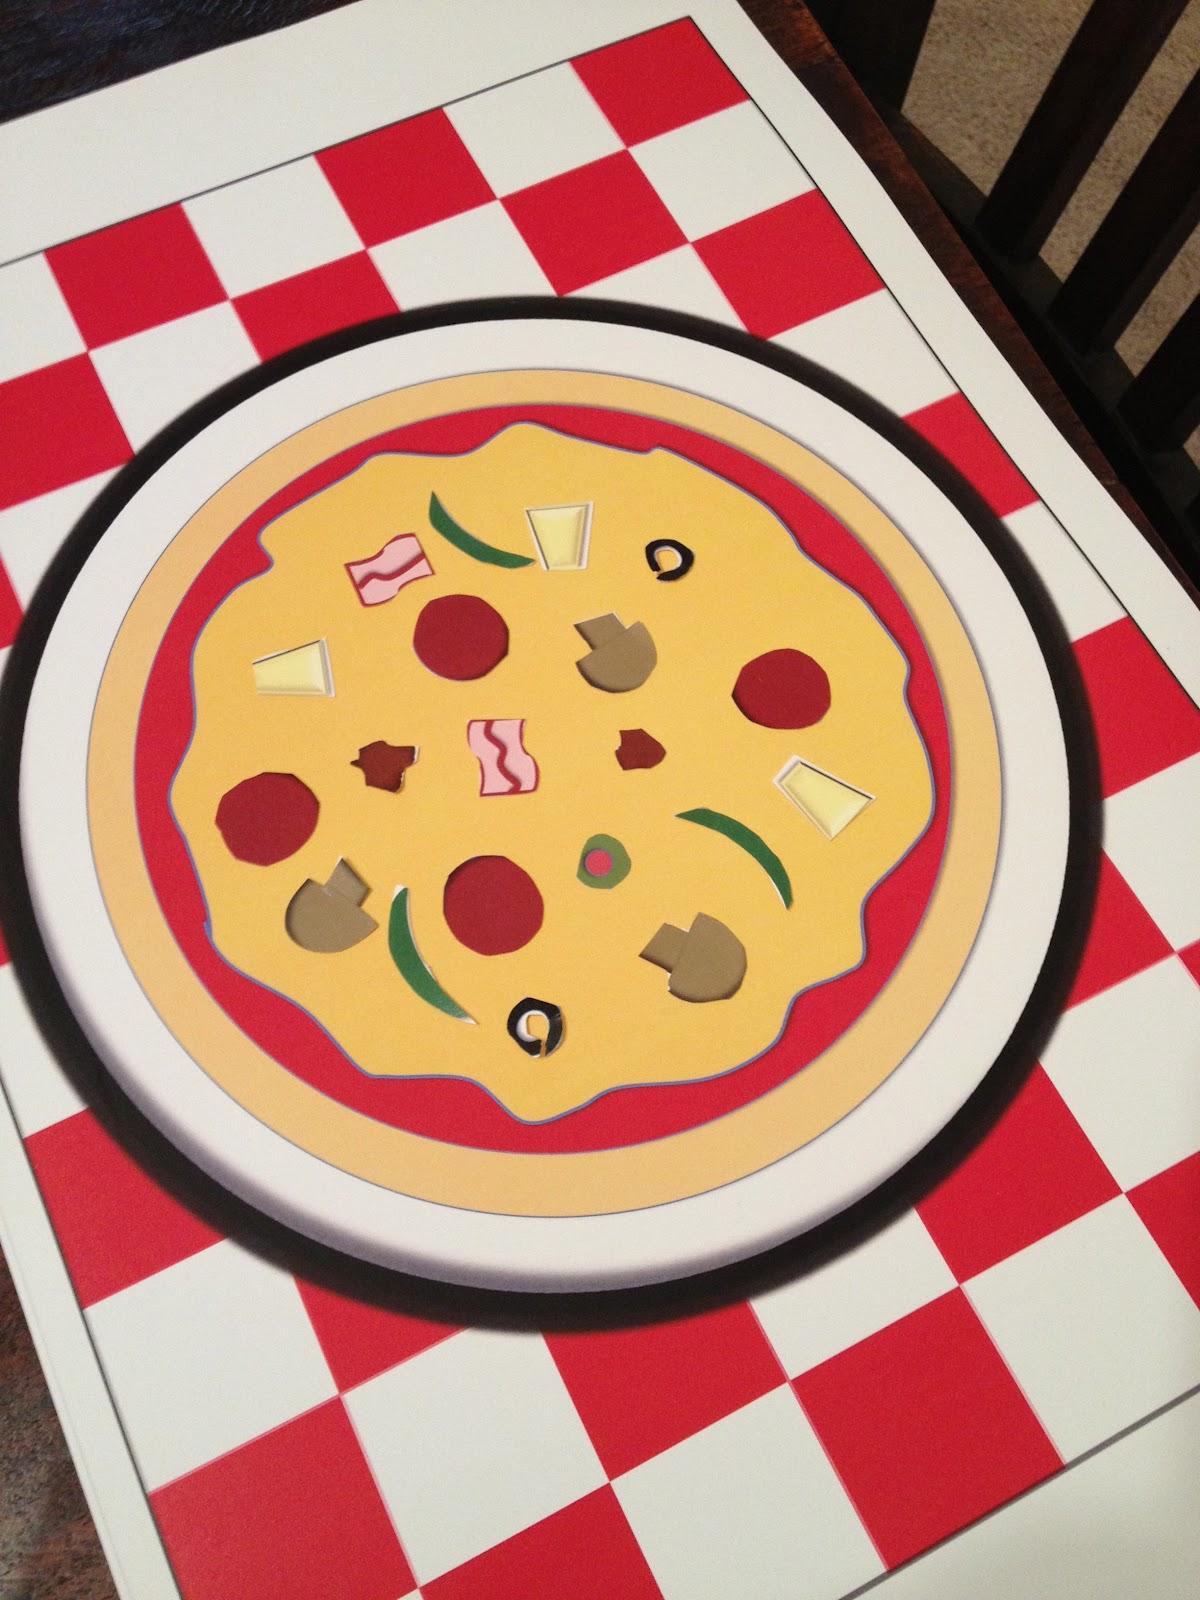 Kids Pizza Party Pizza Place Mat